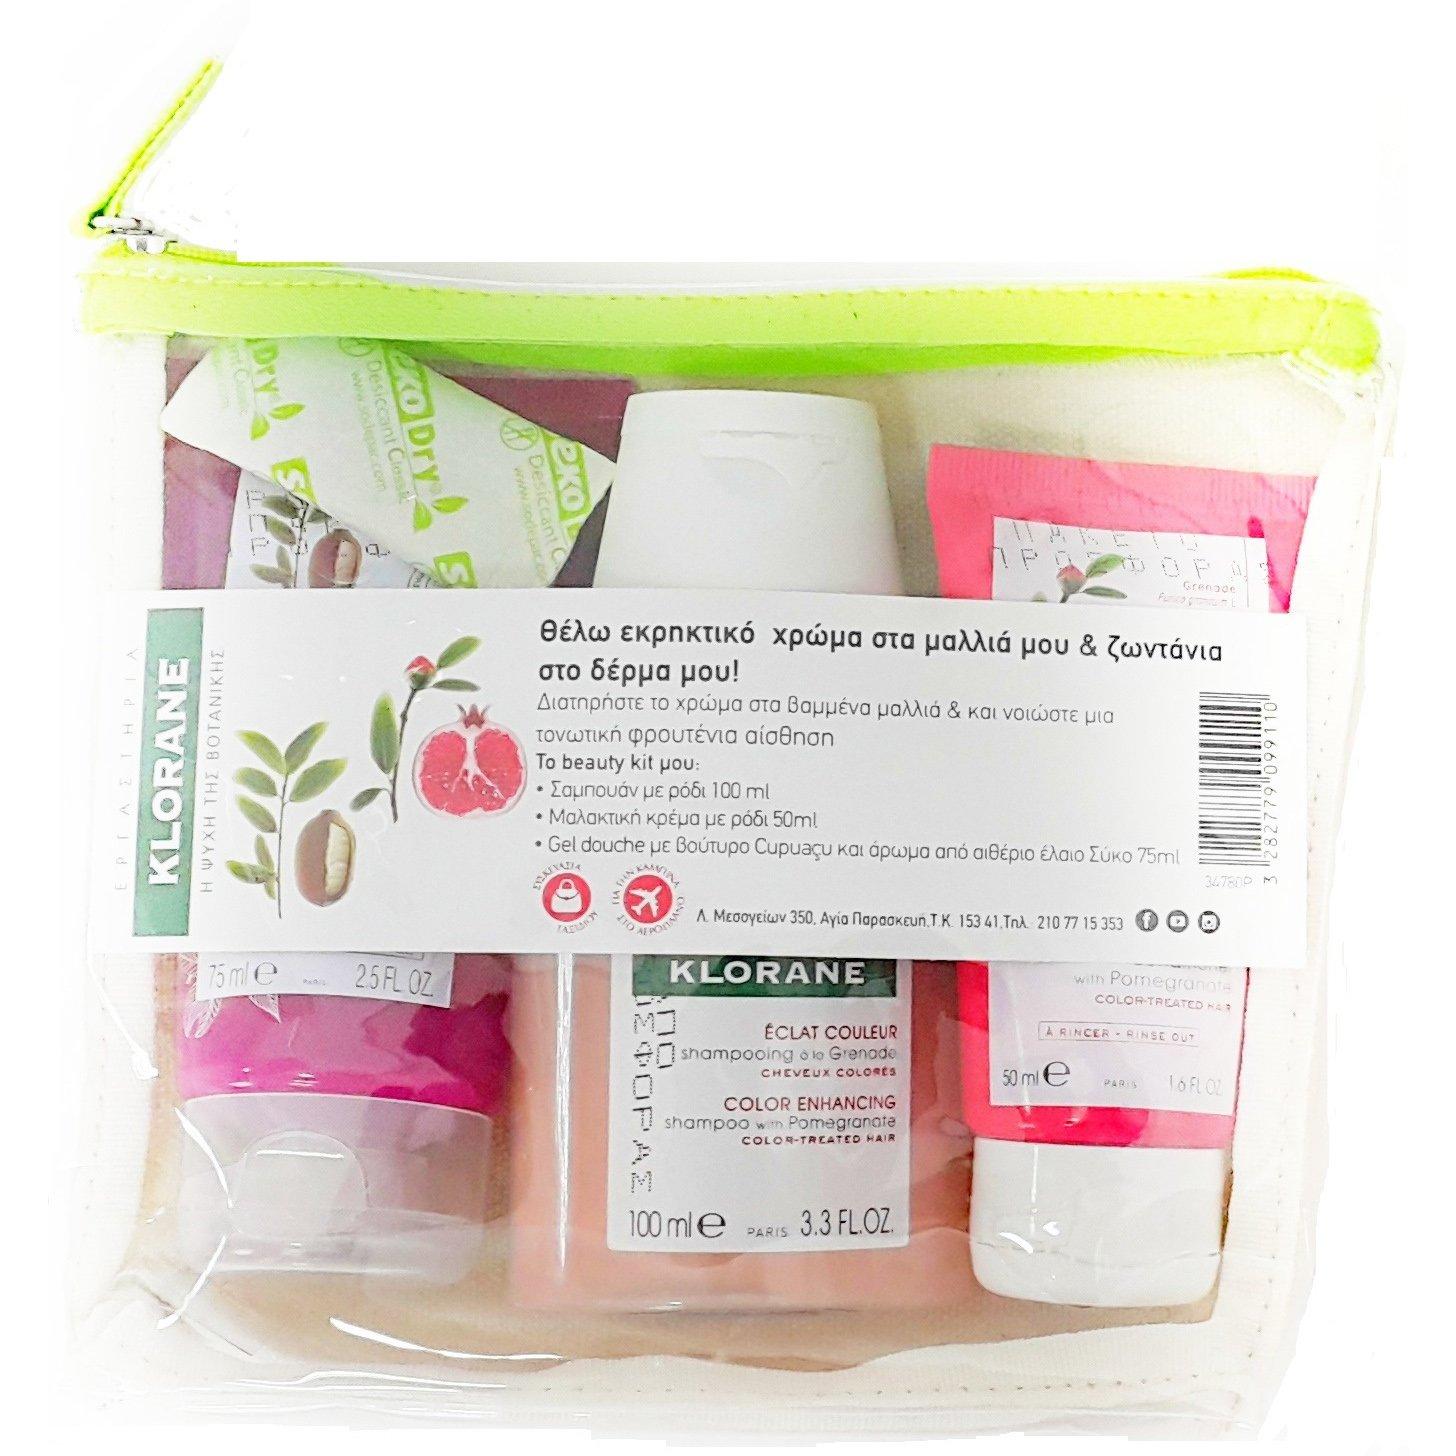 Klorane Travel Size Shampoo με Ρόδι 100ml, Nutrition Baume Μαλακτική με Ρόδι 50ml & Gel Douche με Βούτυρο Cupuacu 75ml